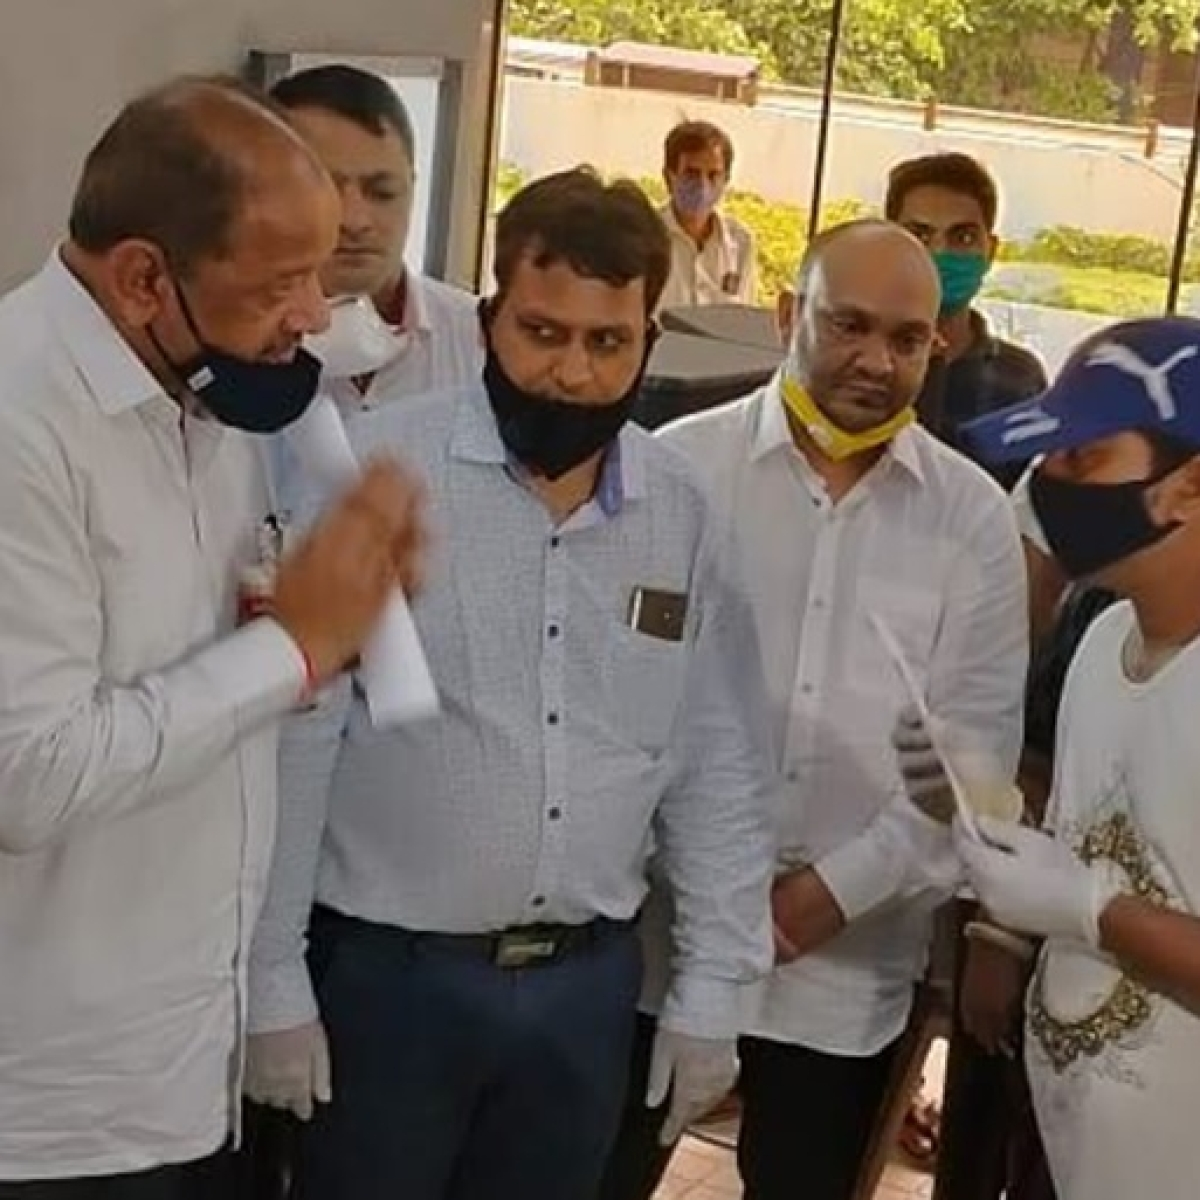 Coronavirus in Mumbai: BJP MP Gopal Shetty felicitates 30 COVID-19 warriors with gold coins, Rs 5000 cash